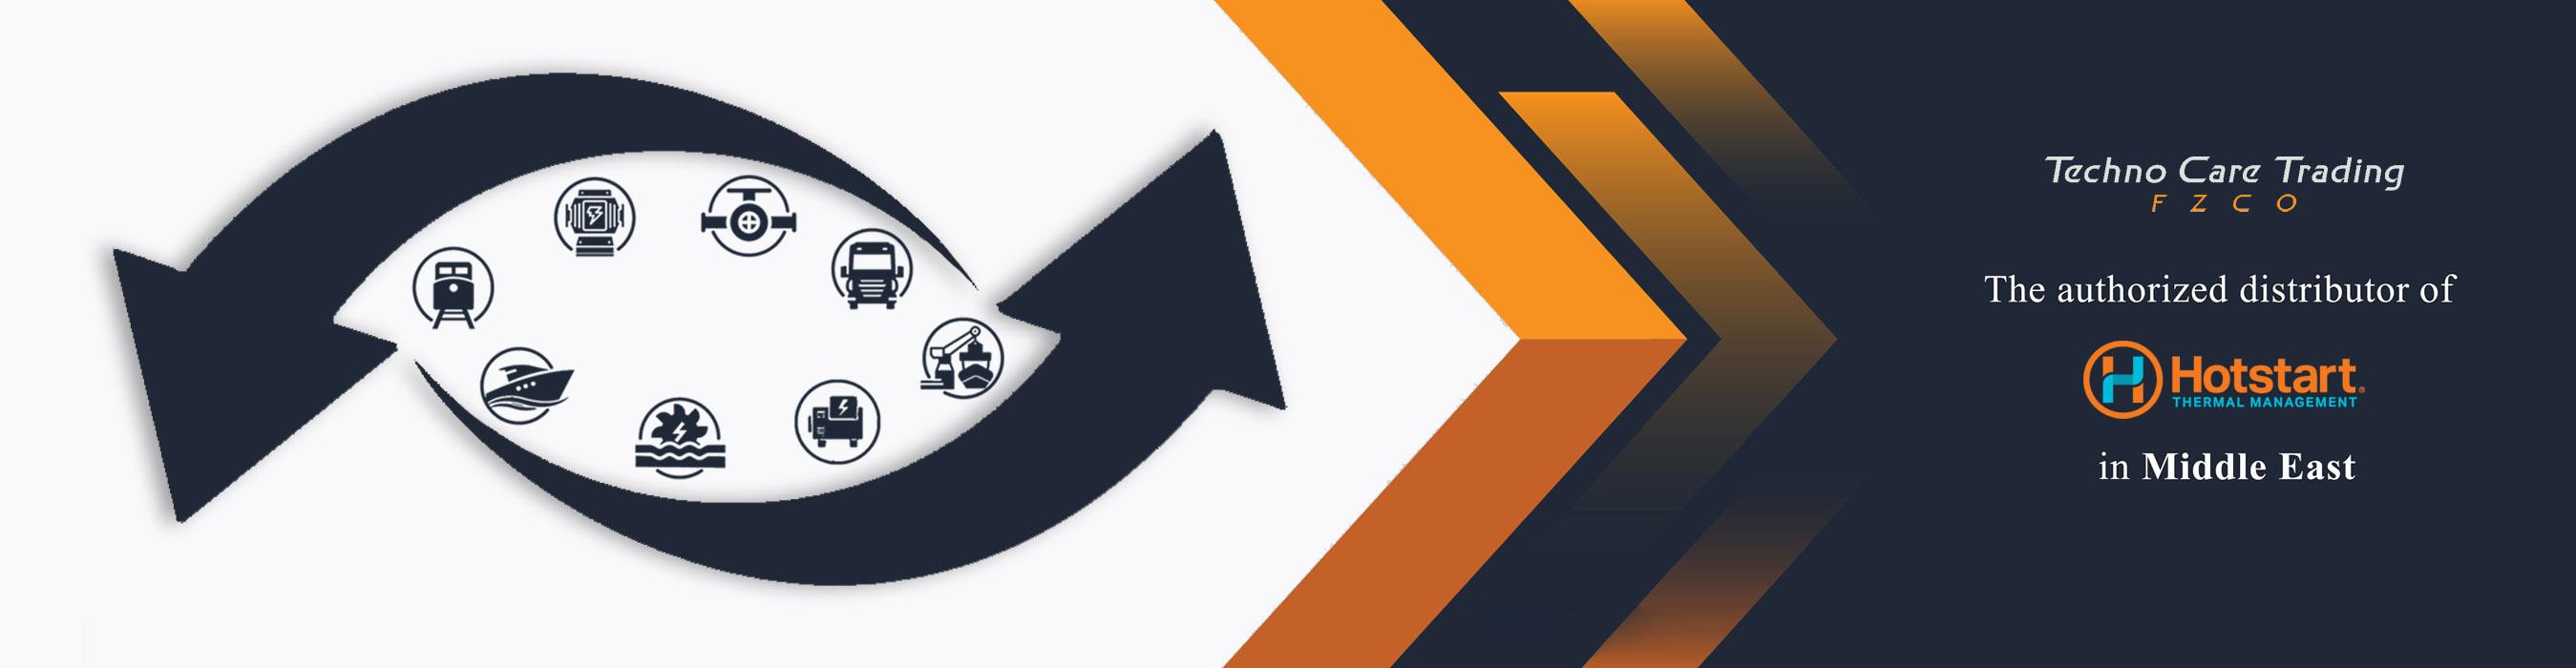 tct.company Banner Hotstart